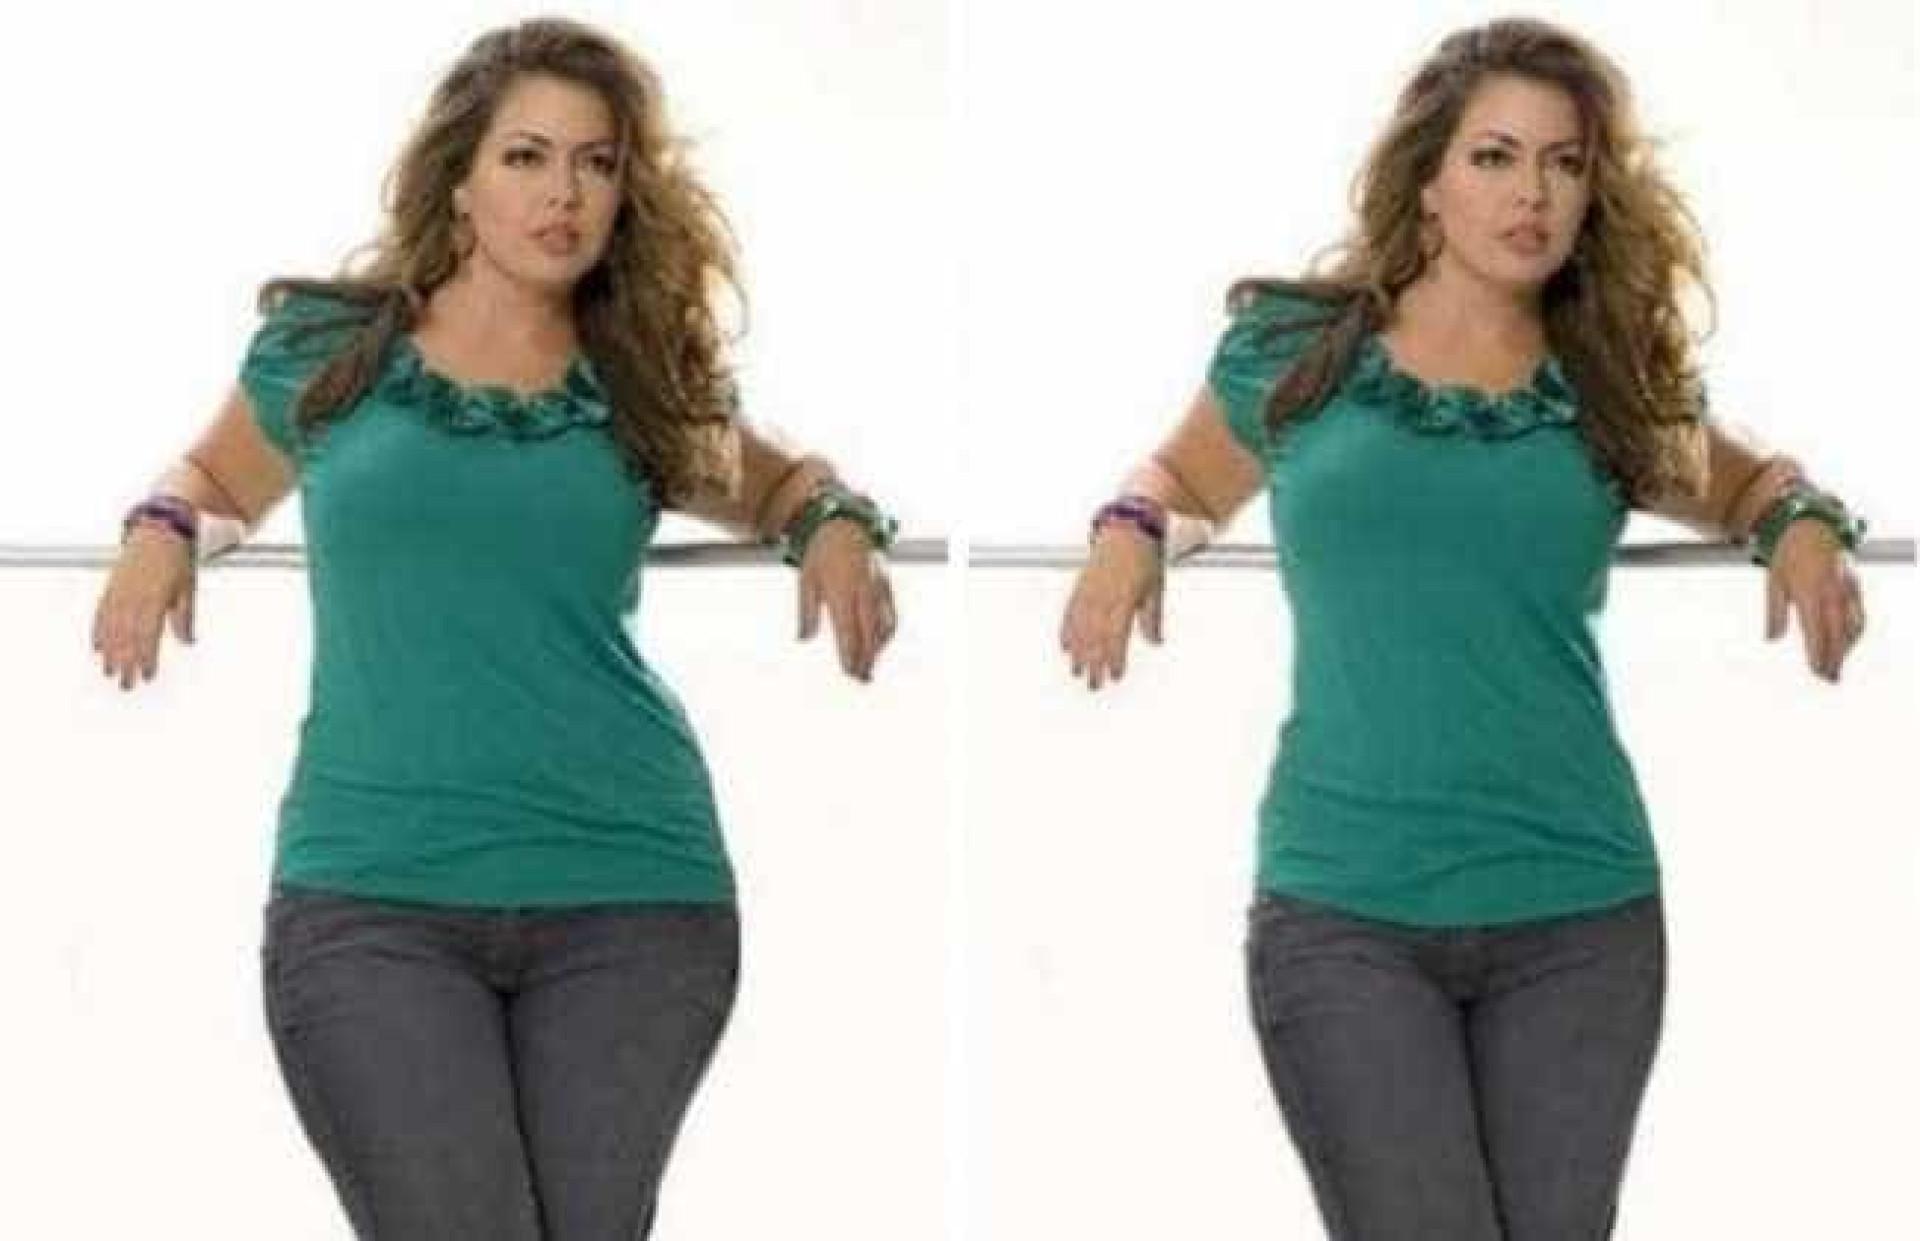 Famosas antes e depois do Photoshop - …